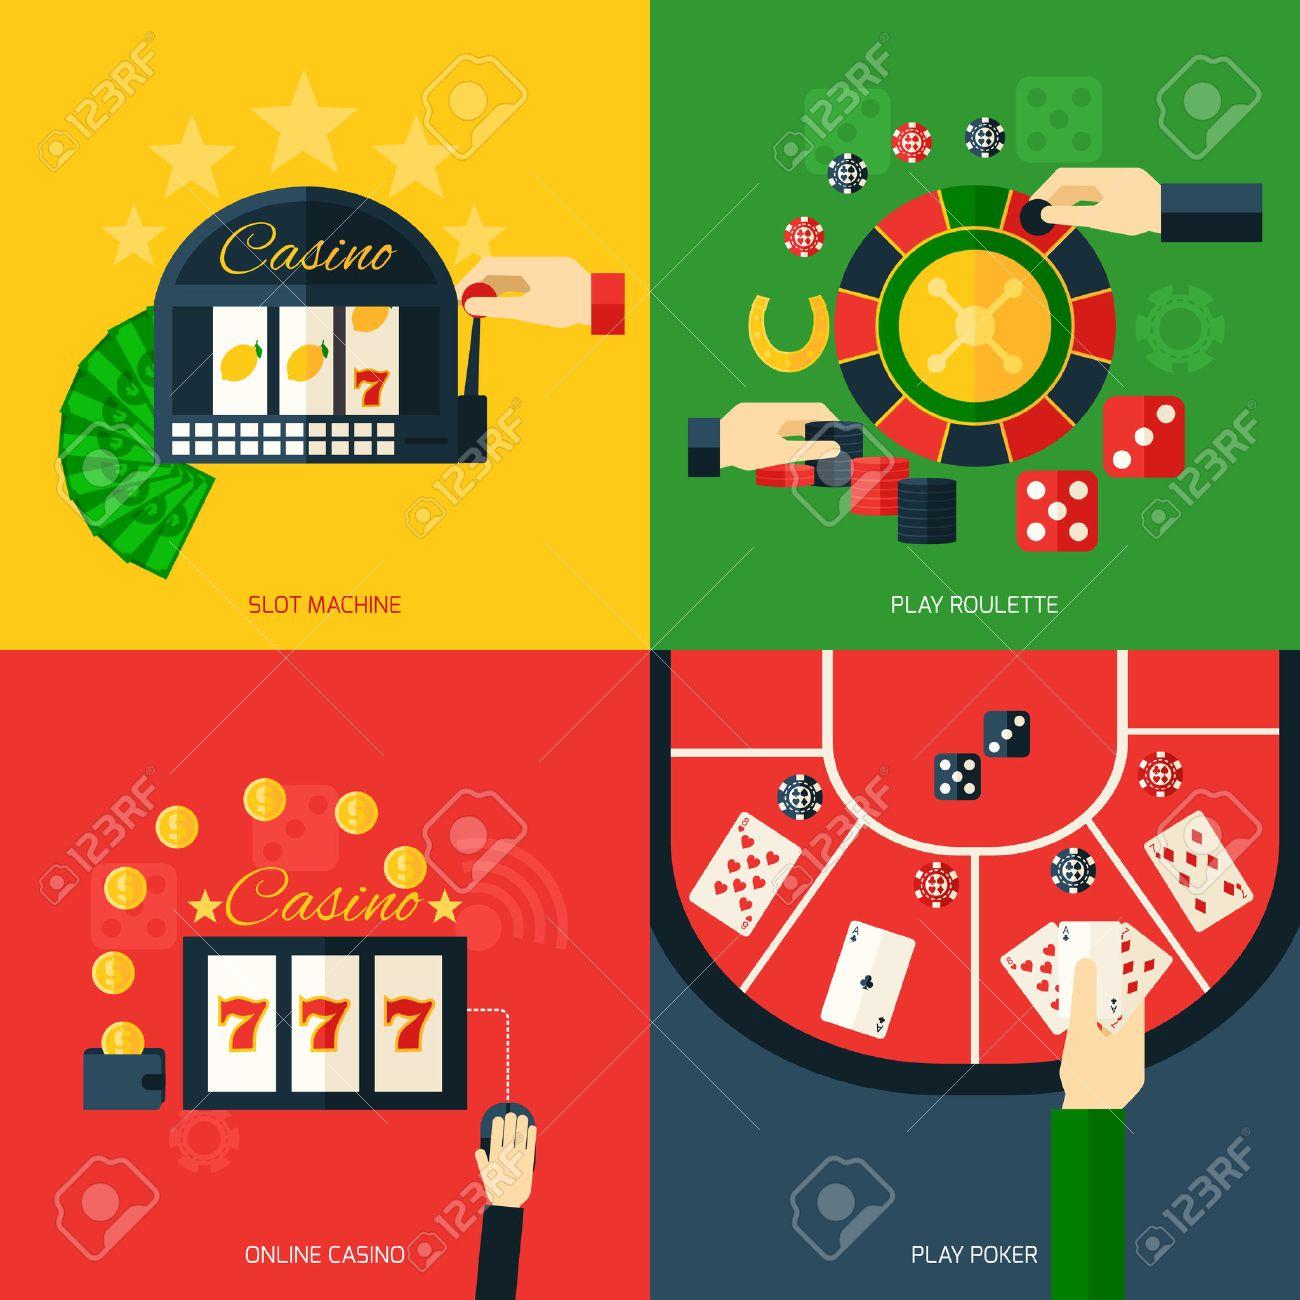 Slot machine roulette gambling online casino chip key